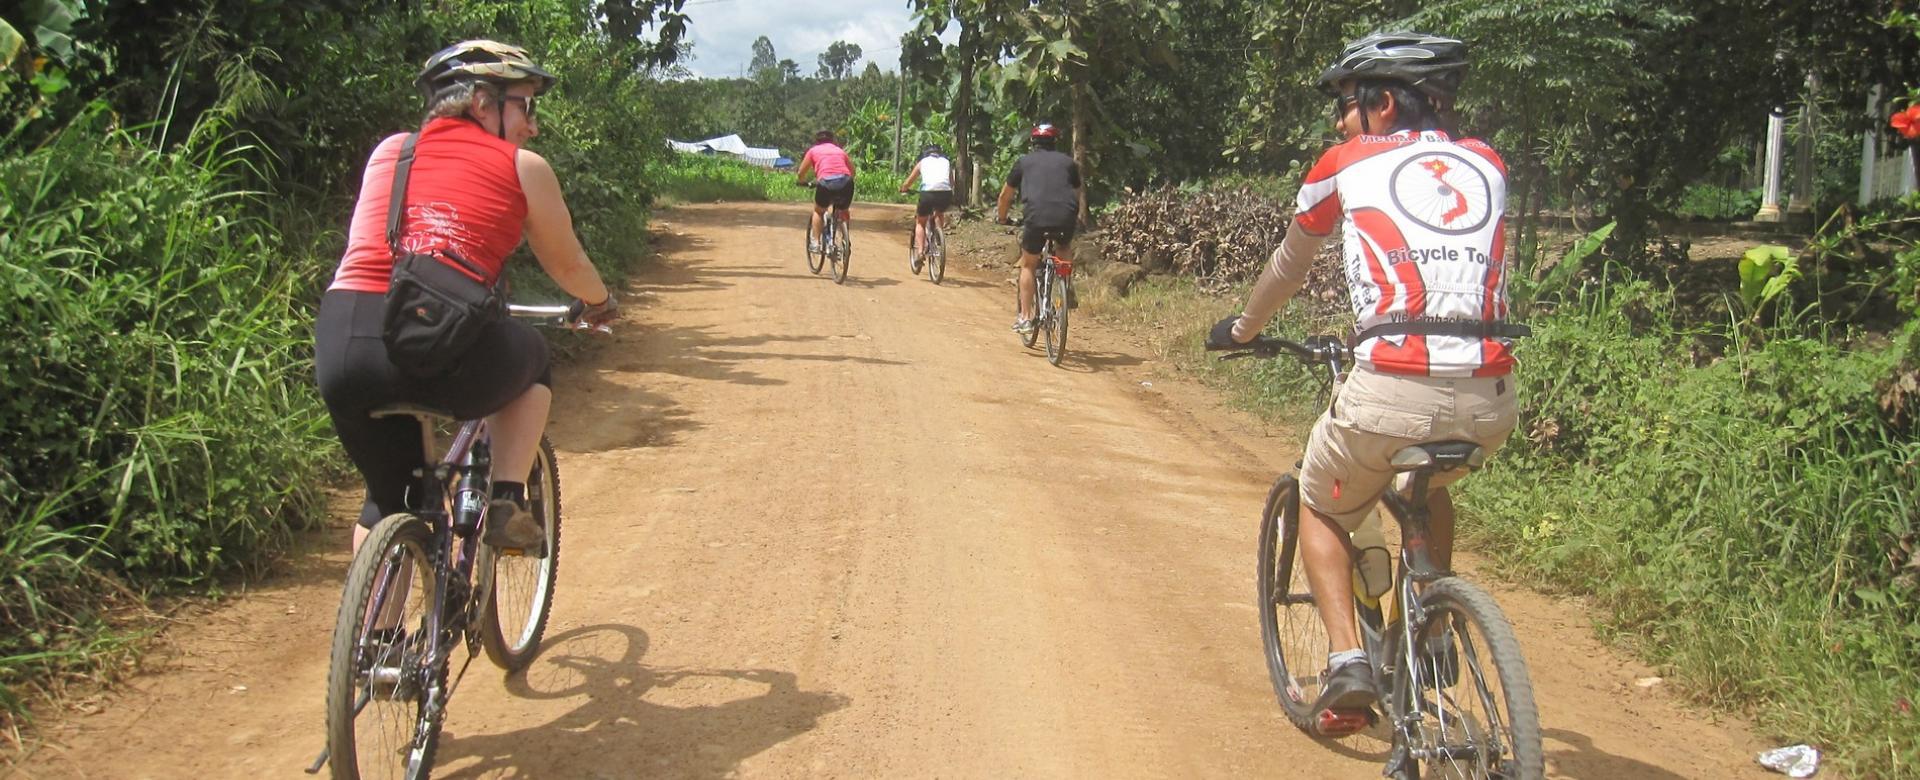 Biking 2 days/1 night to Nam Cat Tien park